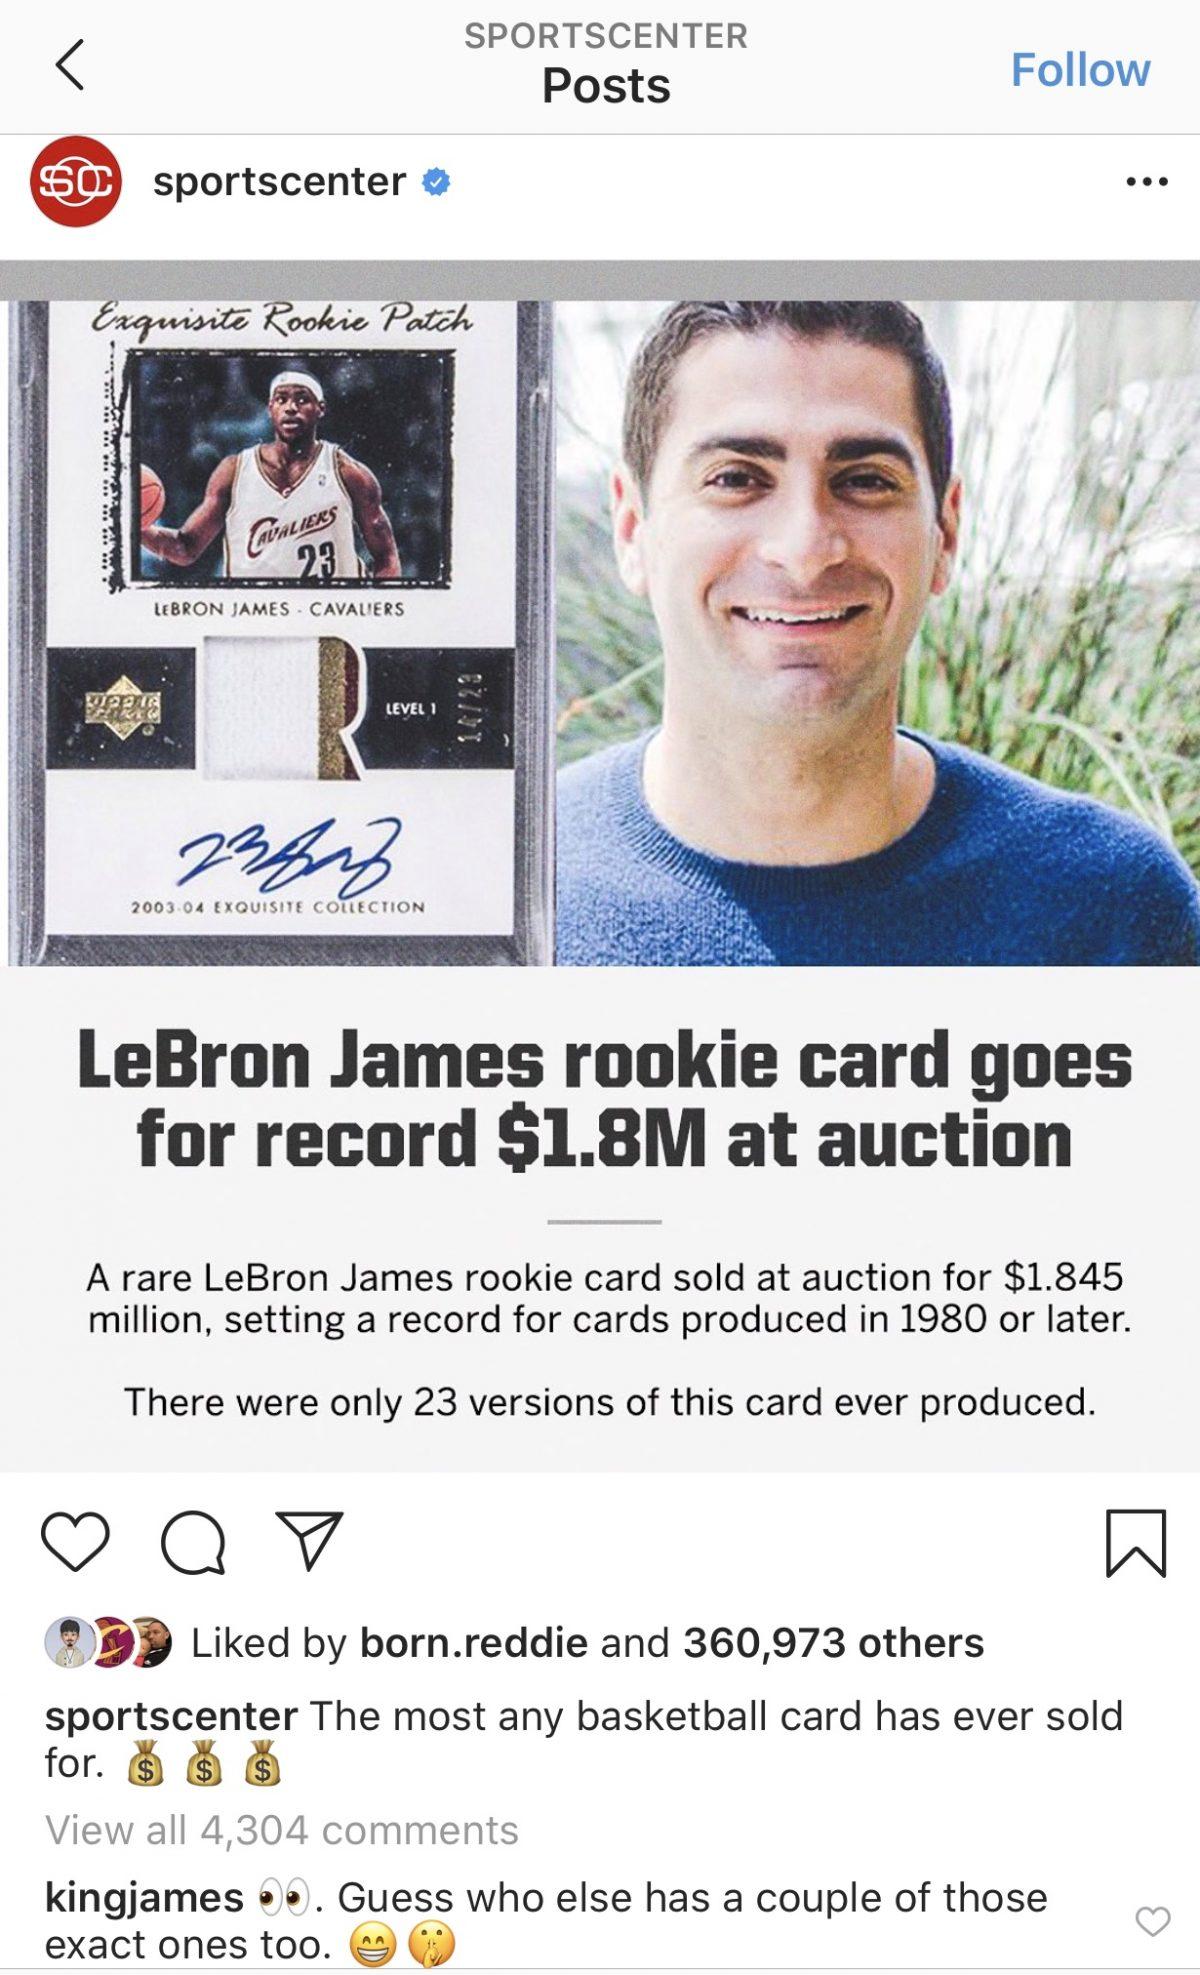 LeBron James Rookie Card